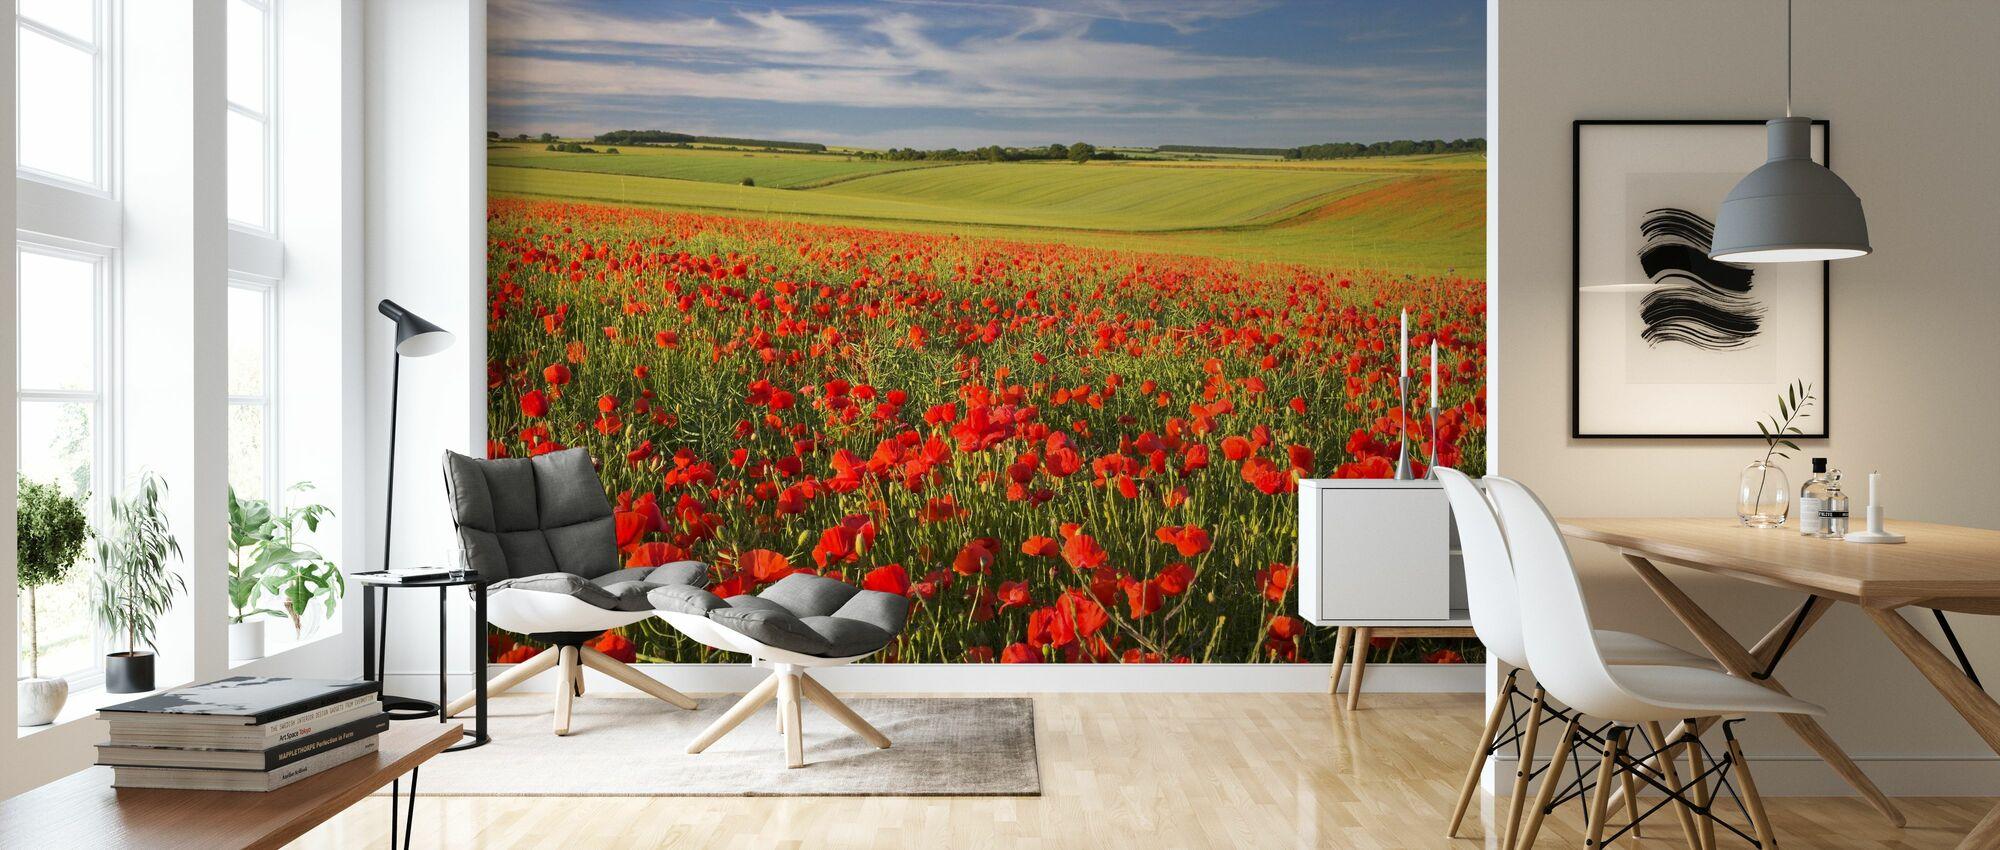 Sea of Poppies - Wallpaper - Living Room